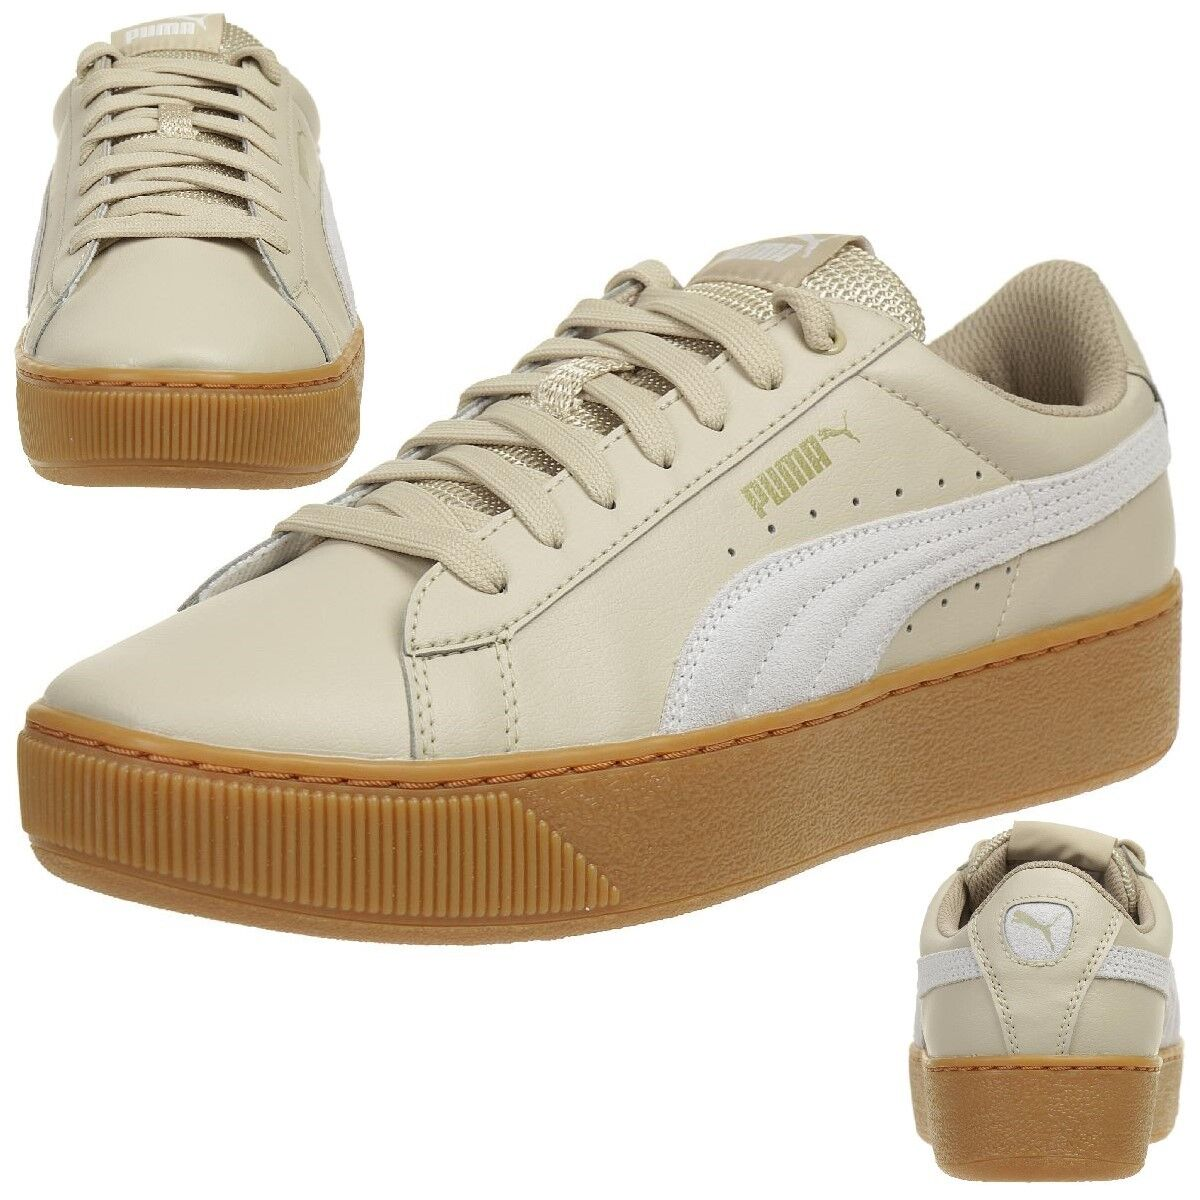 Zapatos de mujer zapatilla de deporte 364893 PUMA Vikky plataforma L 364893 deporte 03 8af24a